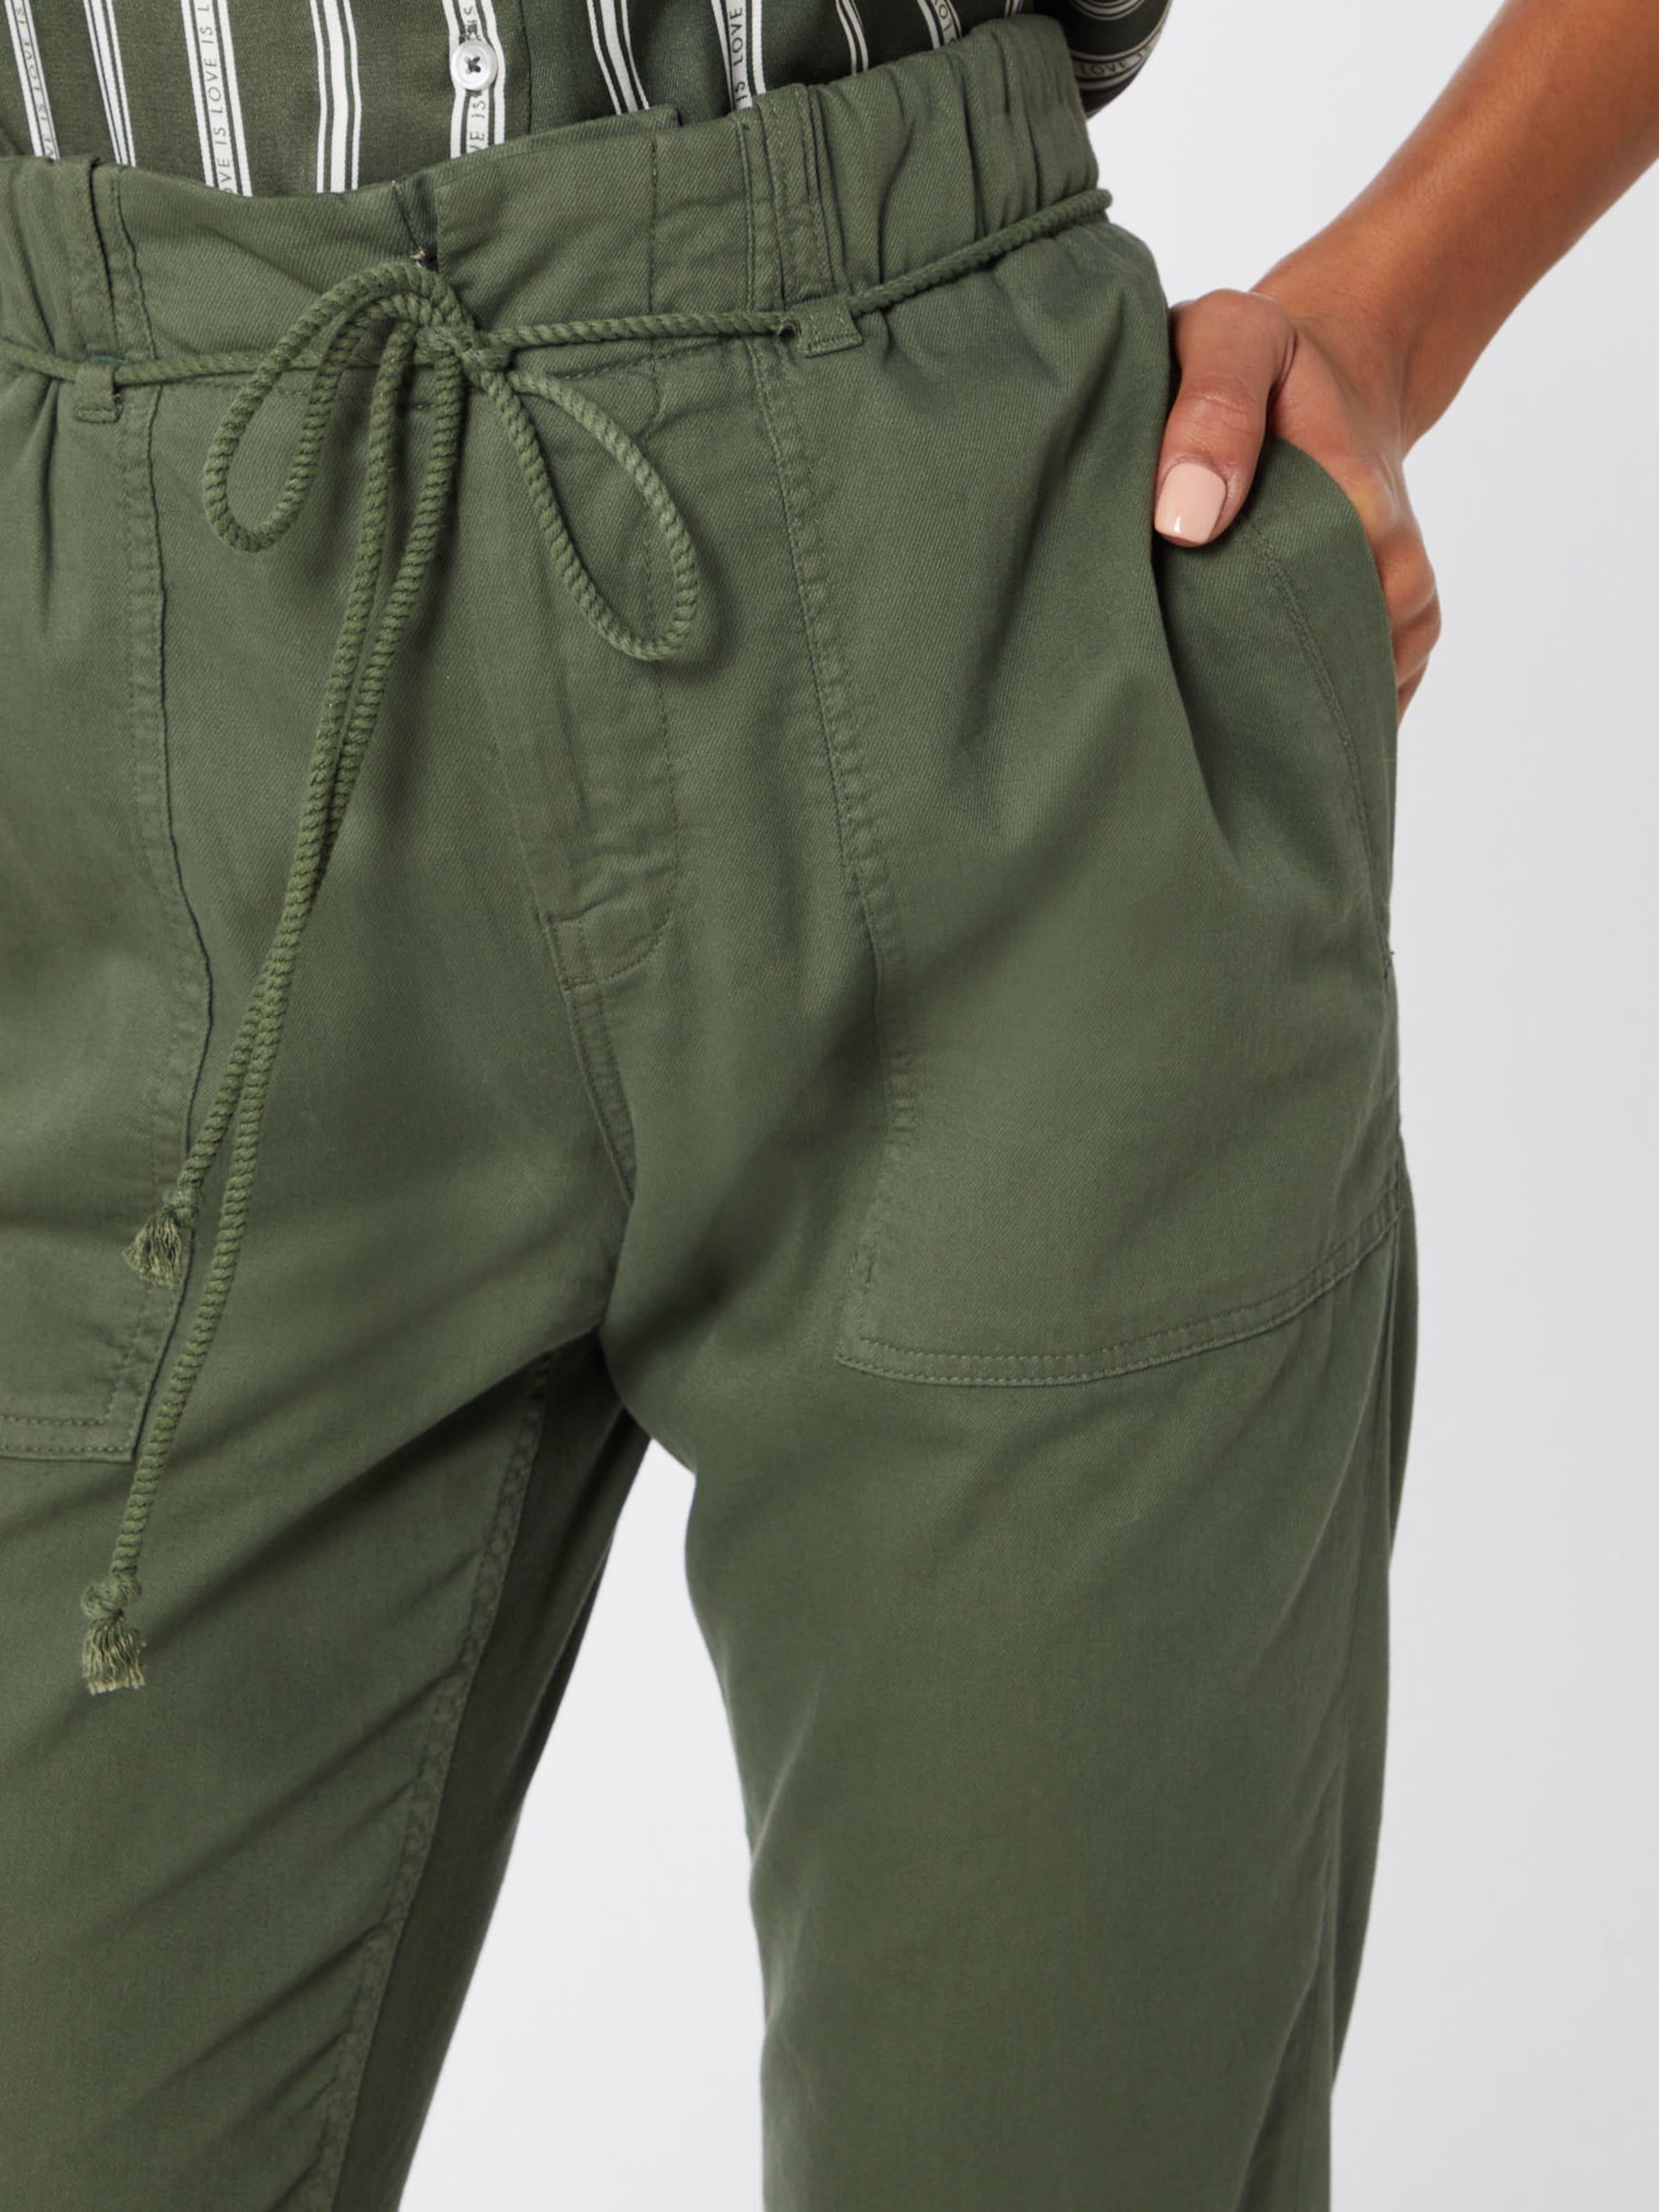 Drykorn Pantalon En Pantalon Pantalon Drykorn En 'bad' 'bad' Blanc Blanc 'bad' Drykorn En sxdtrhBQC